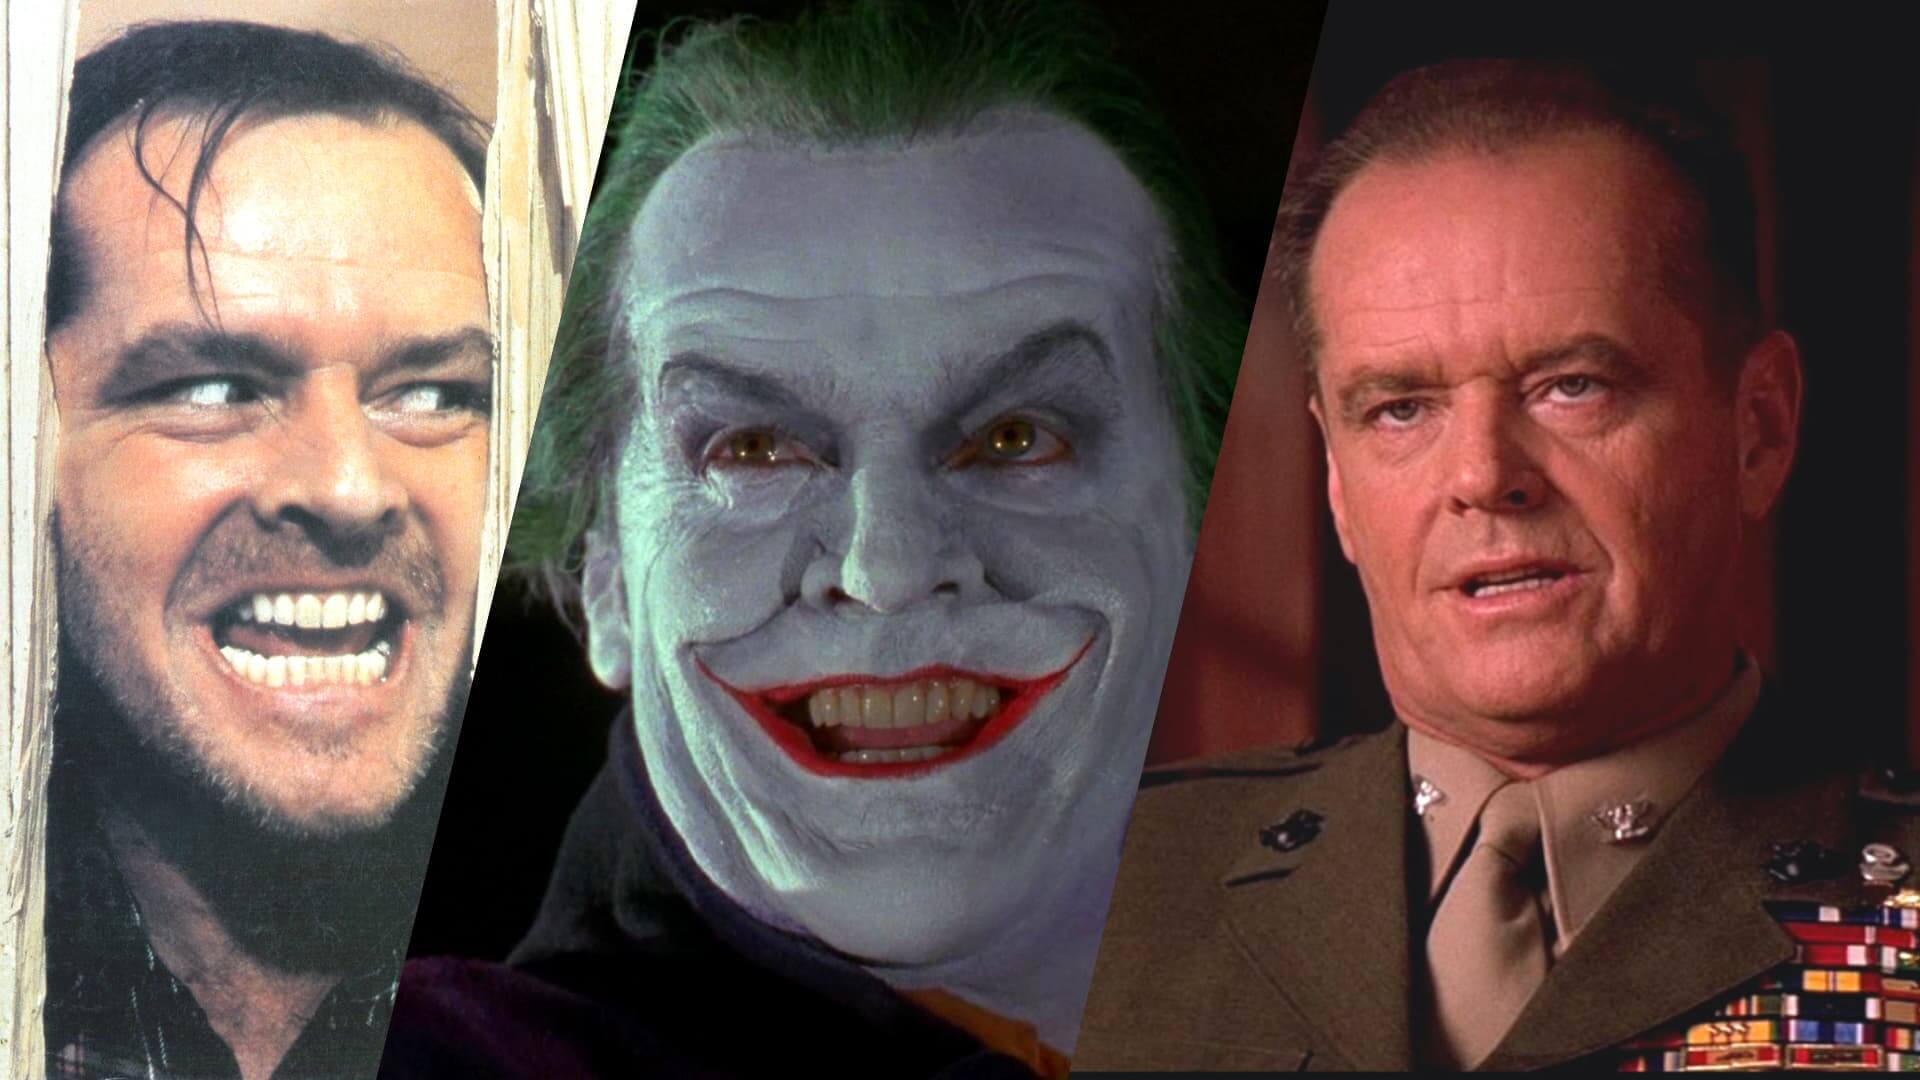 The Madman - 15 Best Jack Nicholson Movies - Featured - StudioBinder